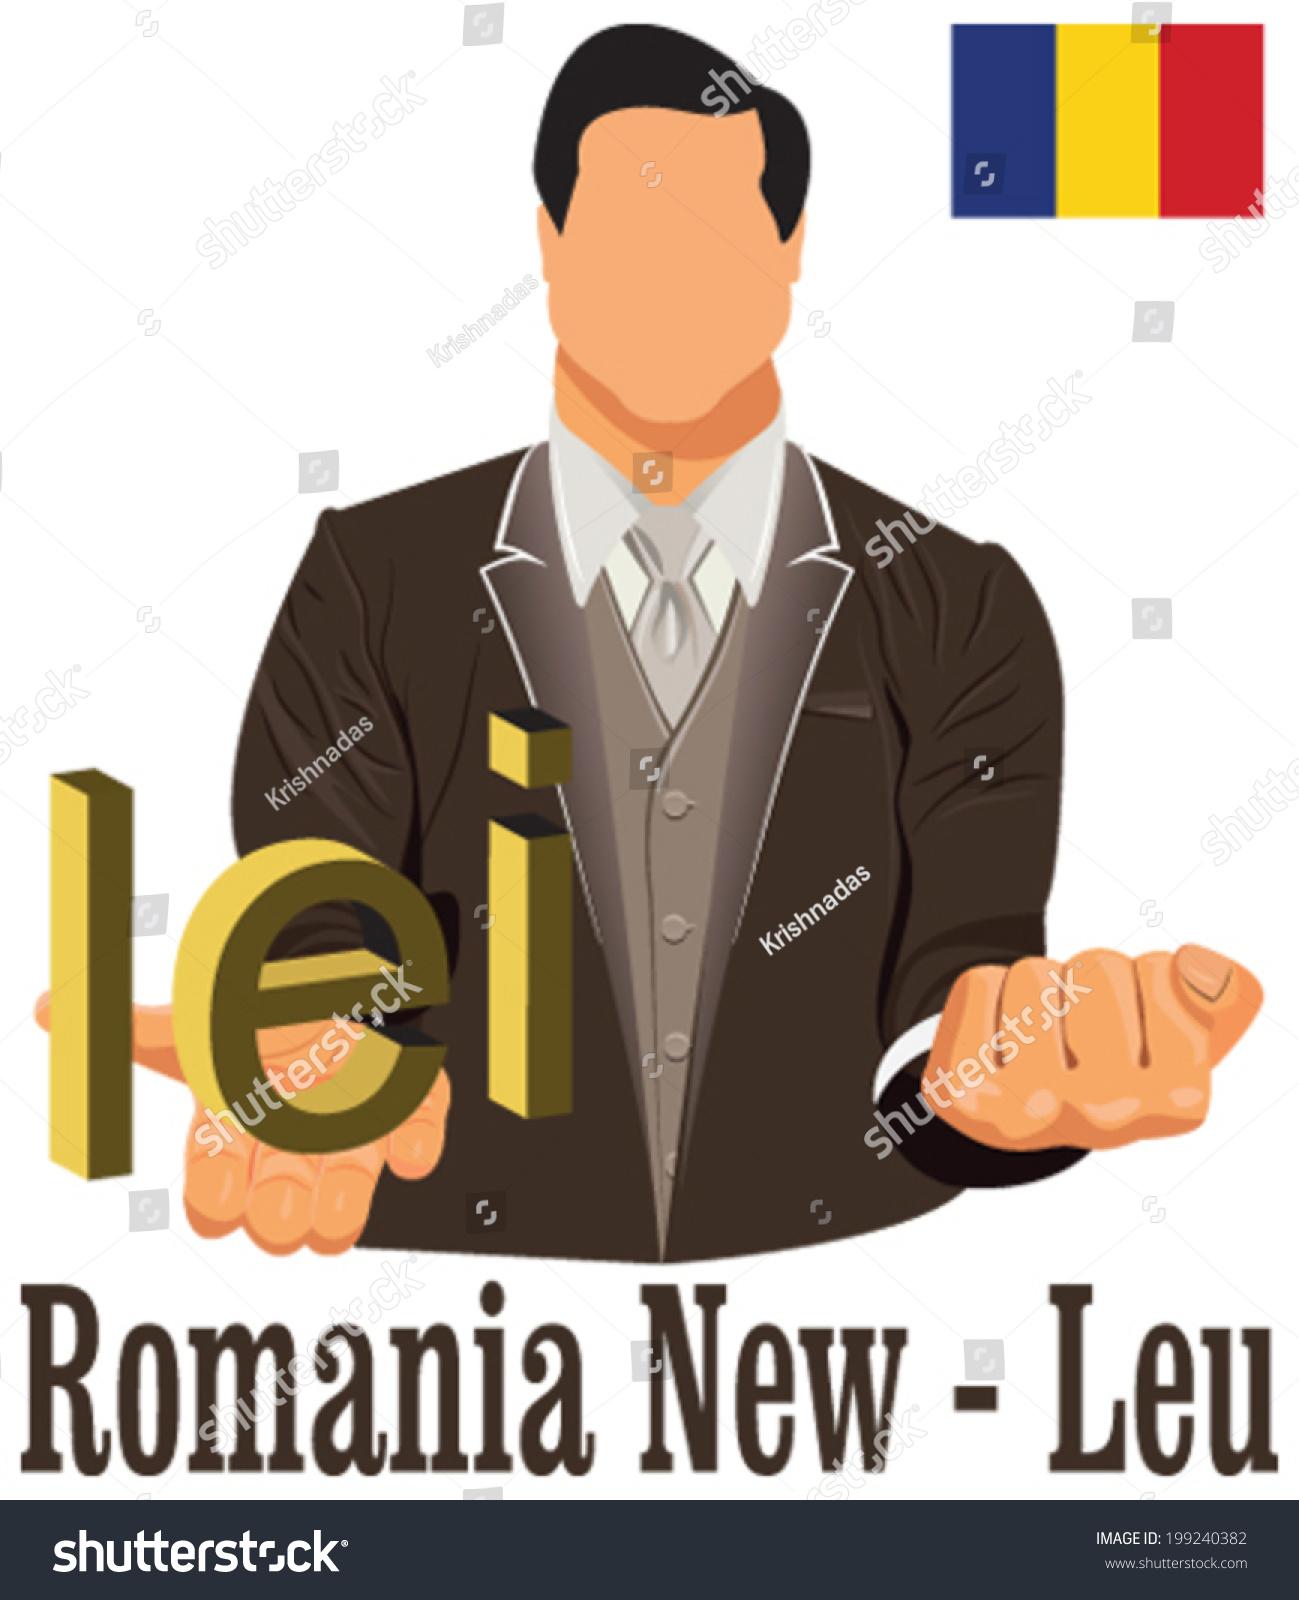 Romania national currency symbol romanian leu stock vector romania national currency symbol romanian leu representing money and flag vector design concept of businessman biocorpaavc